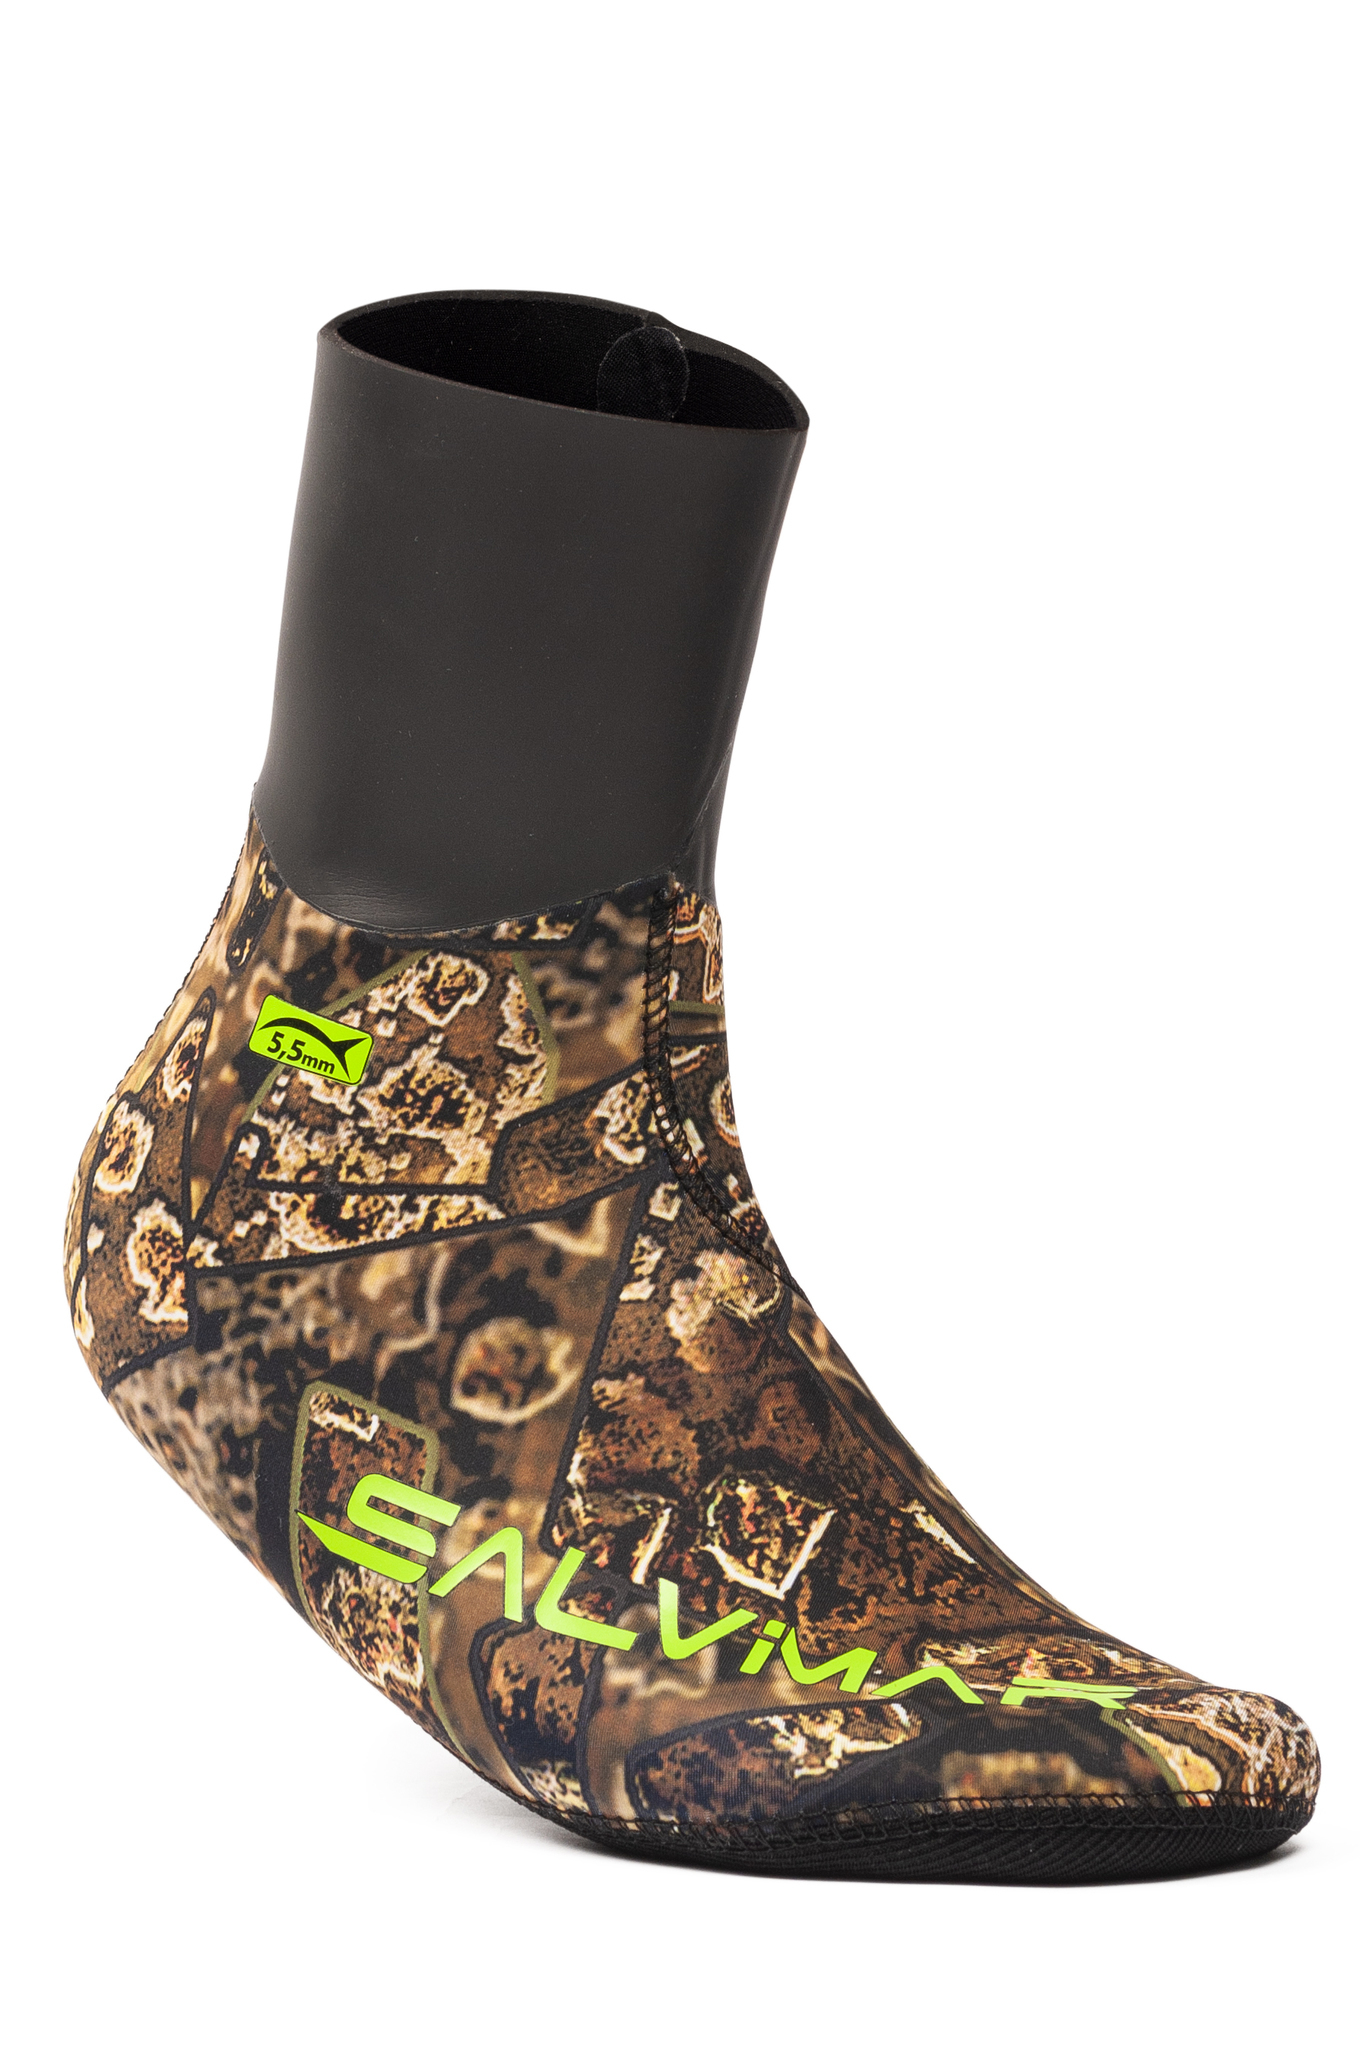 Носки Salvimar Garda Krypsis 7 мм